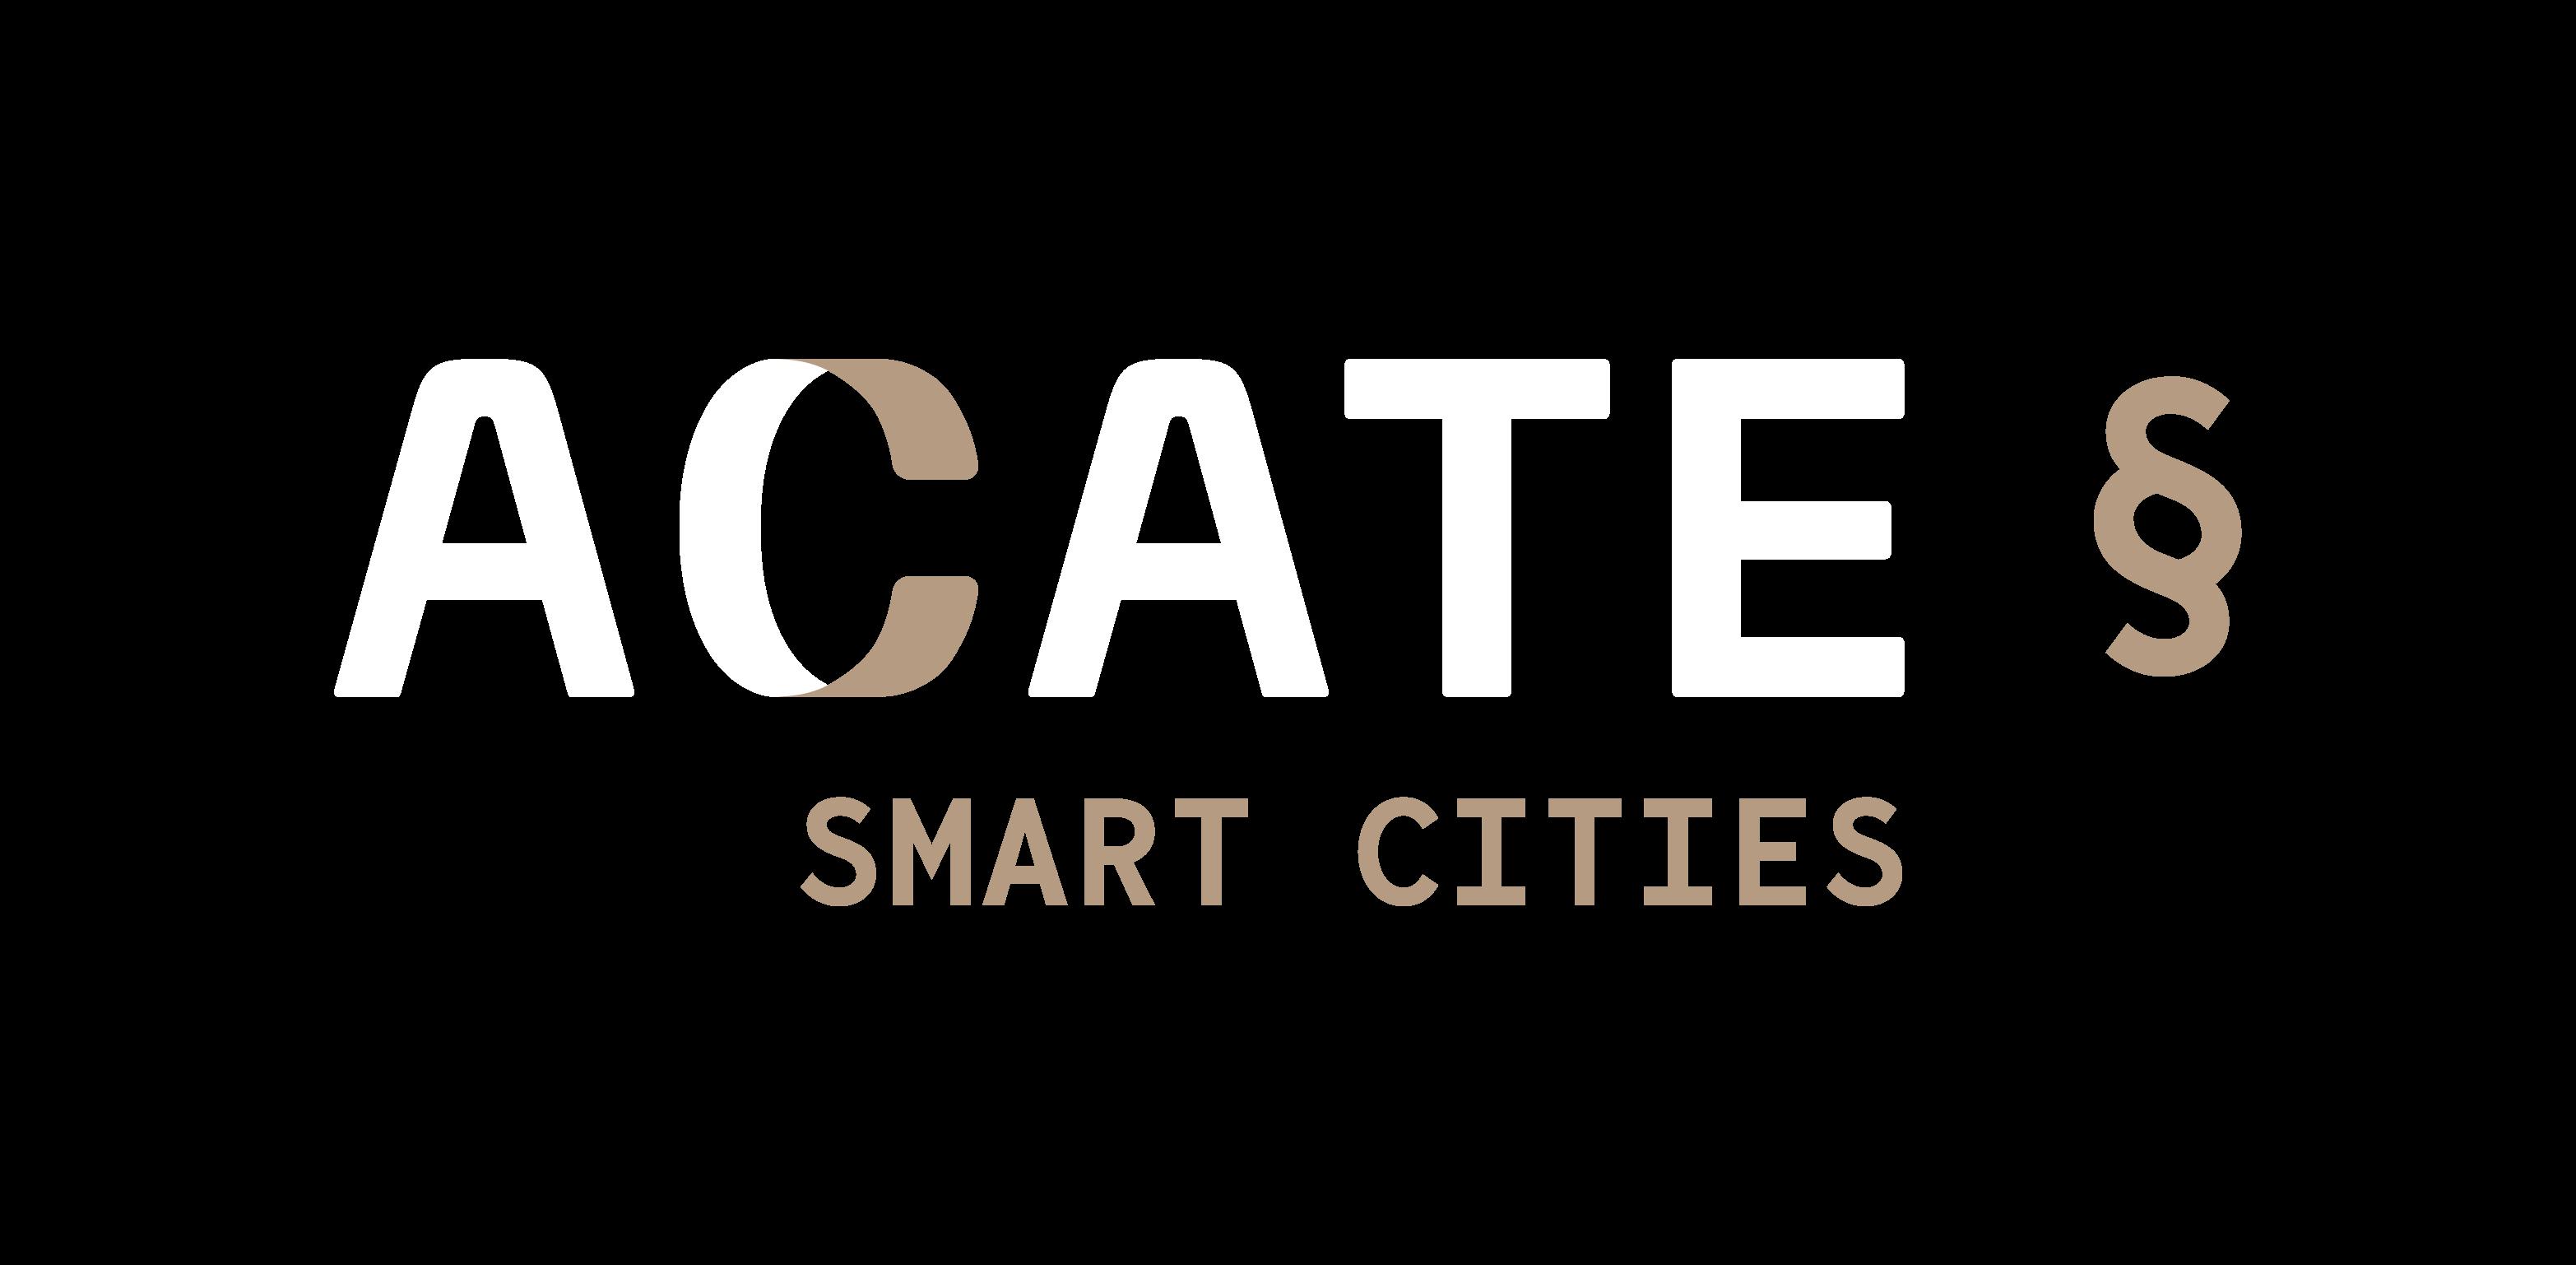 acate smart cities